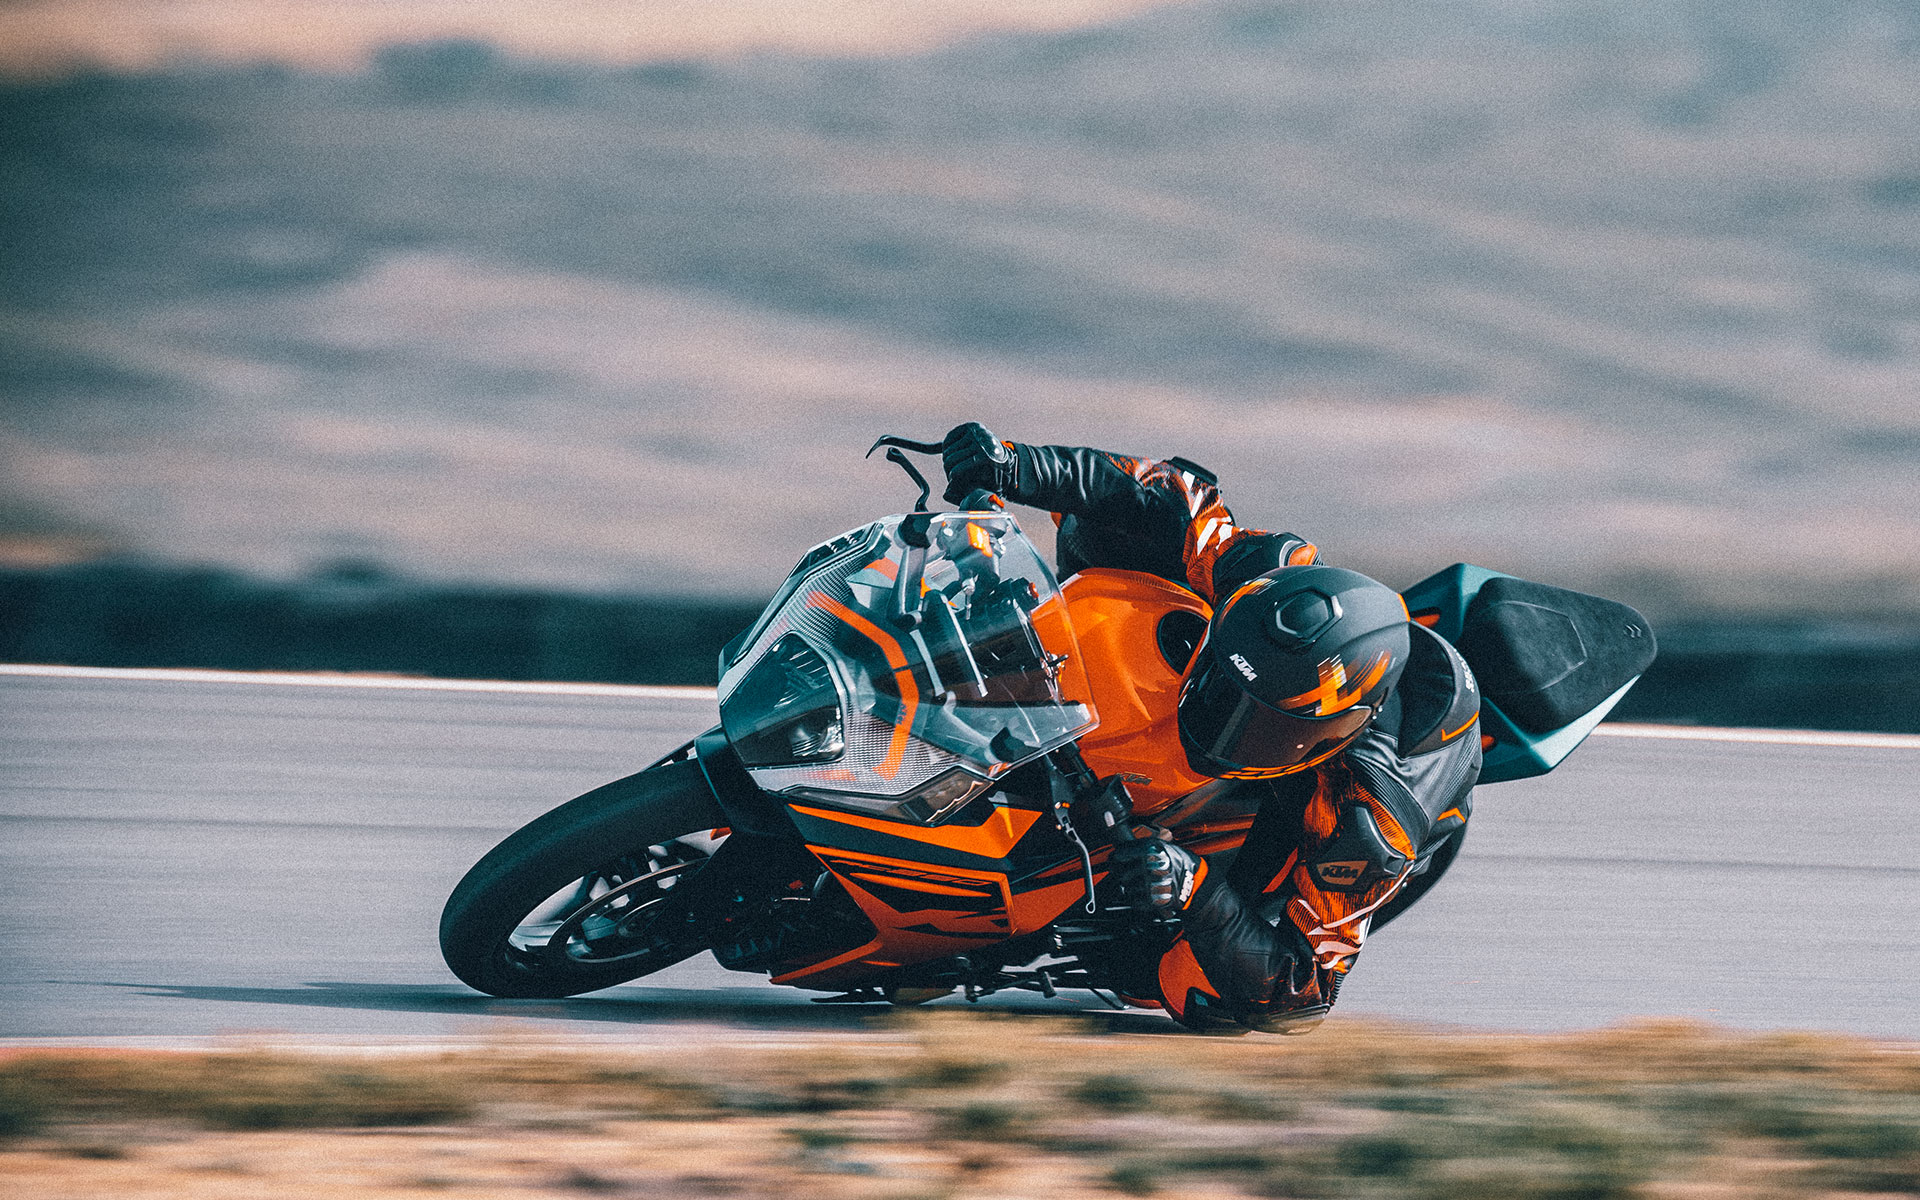 KTM RC 390, 2022 yarış pistinde